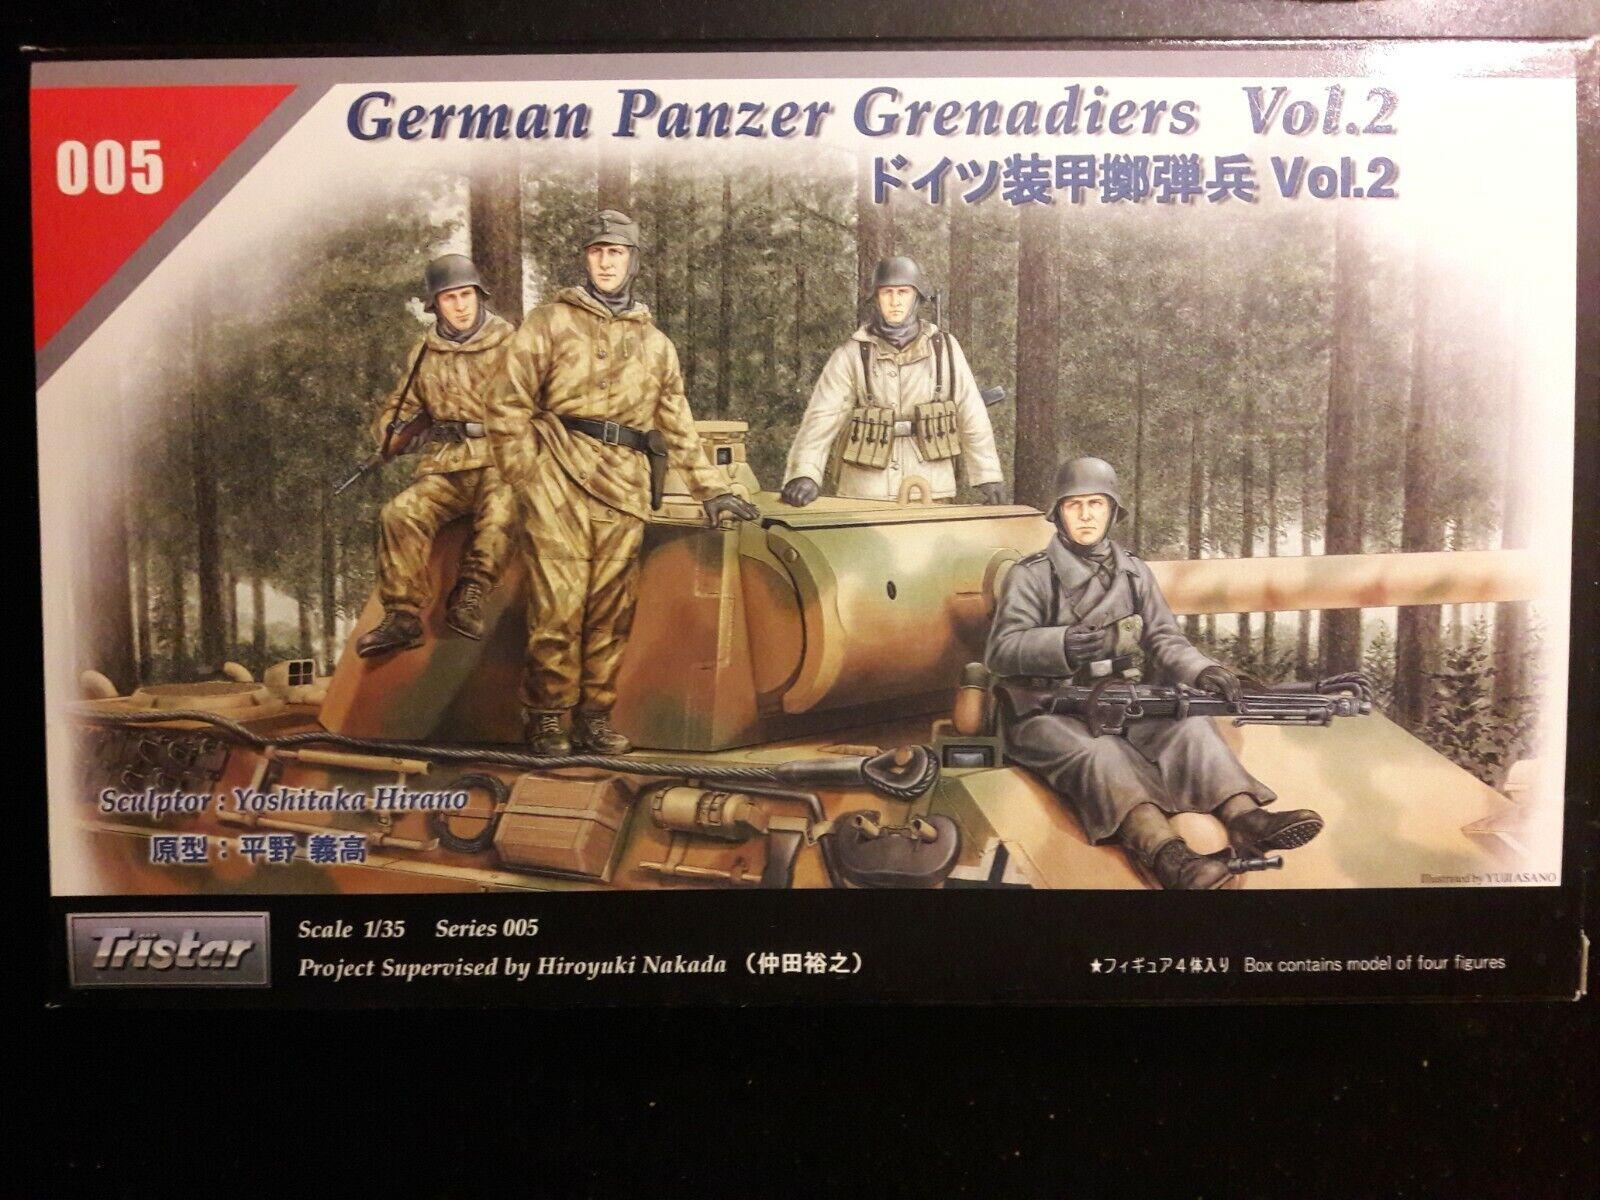 TRISTAR 35055 WWII German Panzer Crew Set Figuren in 1:35